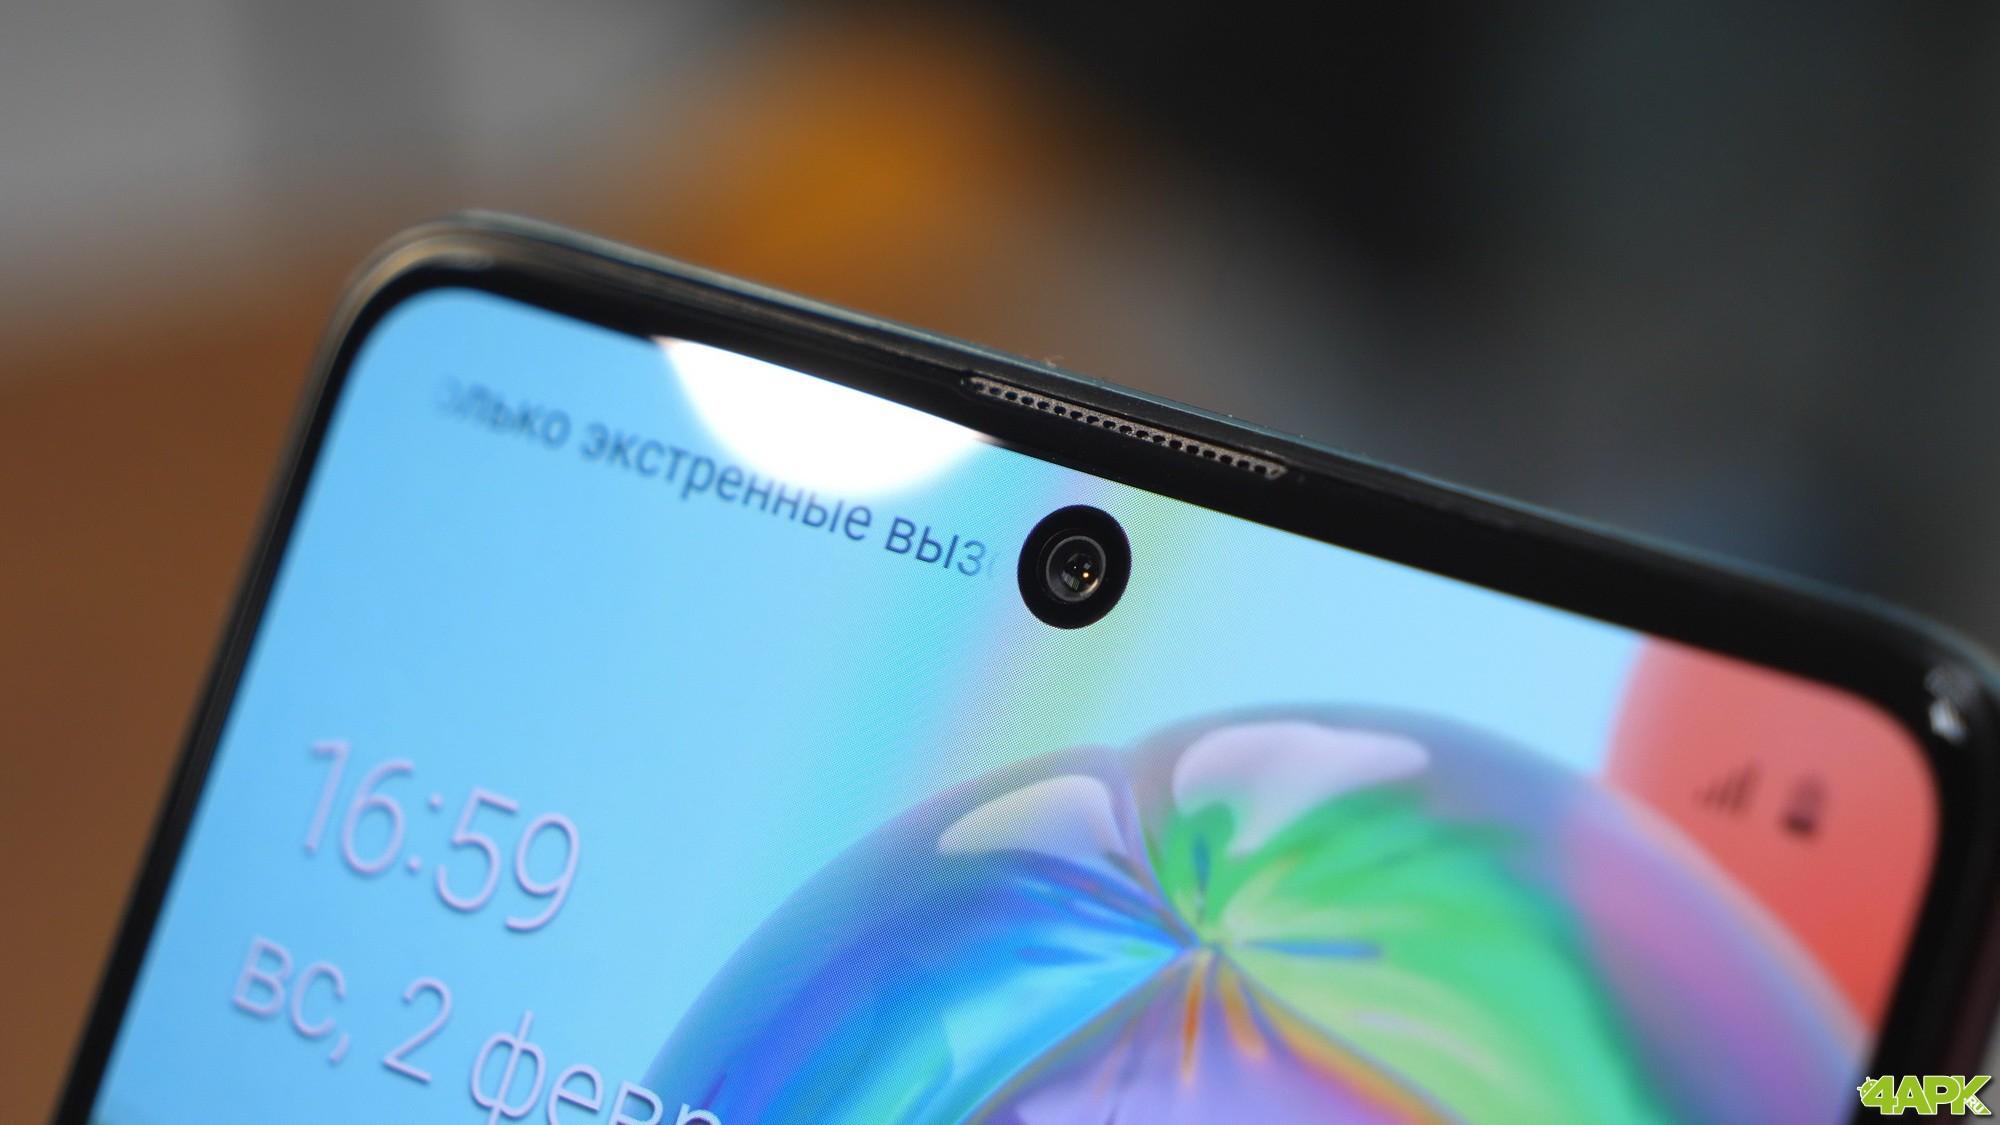 Обзор Samsung Galaxy A71: завышенный середнячок Samsung  - obzor_samsung_galaxy_a71_overprajsnutyj_serednak_picture13_0-1